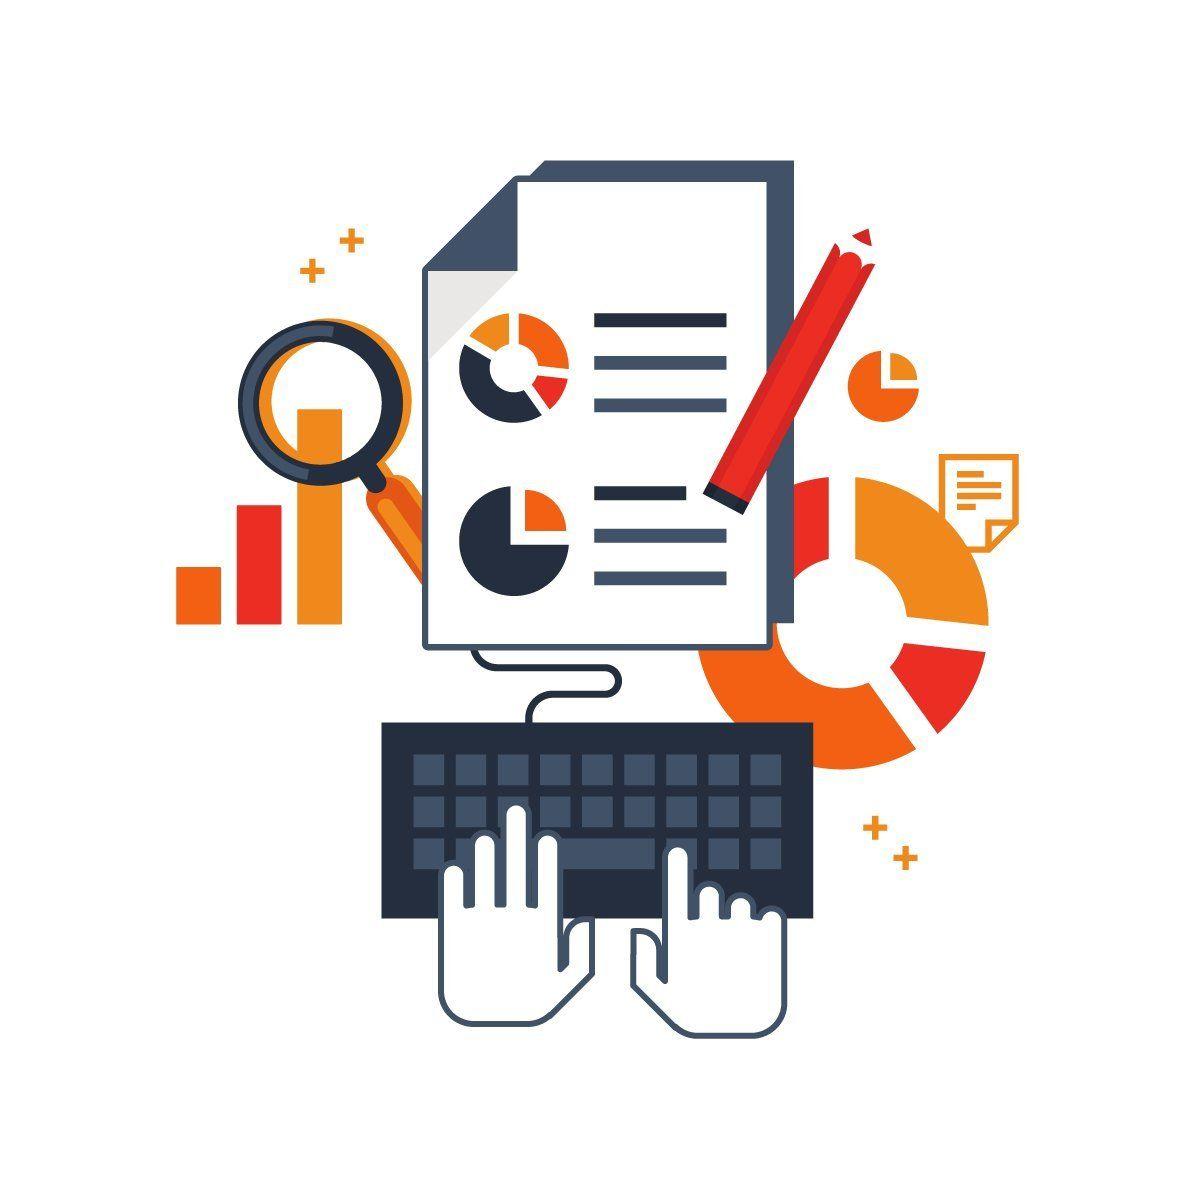 firecircle-icon-graphic-analytics-large-white-digital-marketing